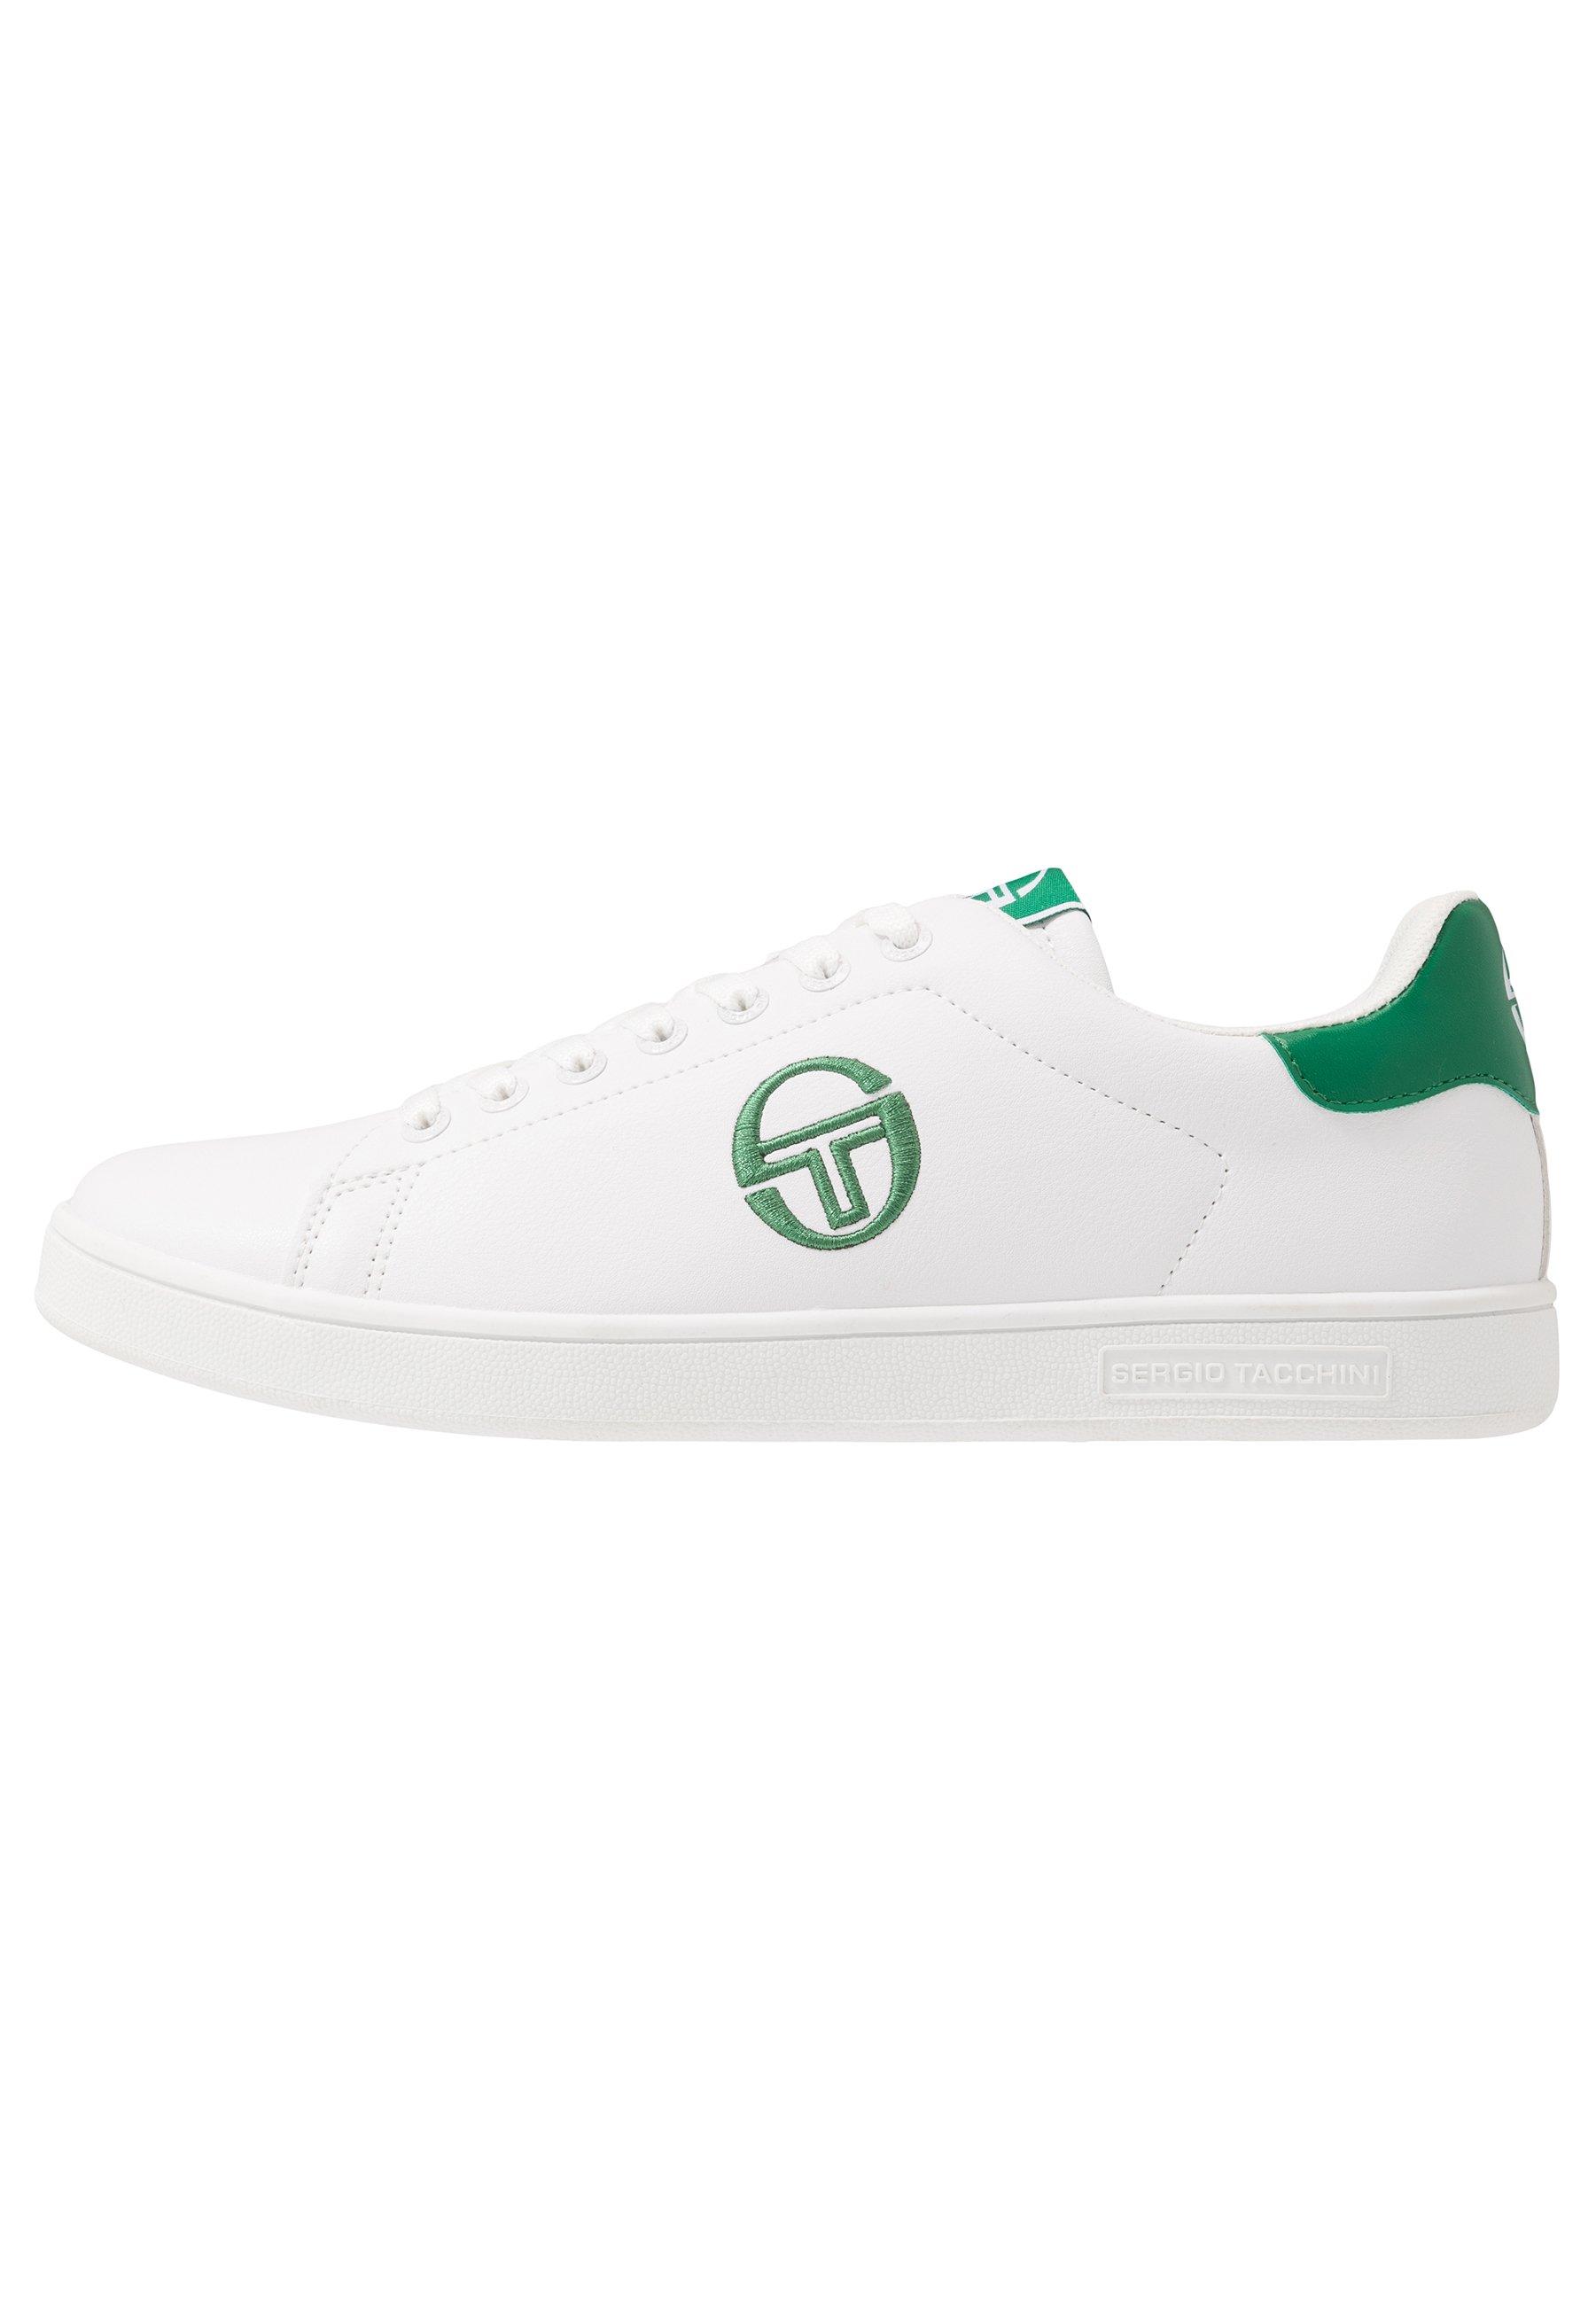 sergio tacchini GRAN TORINO Sneakers navywhite Zalando.se